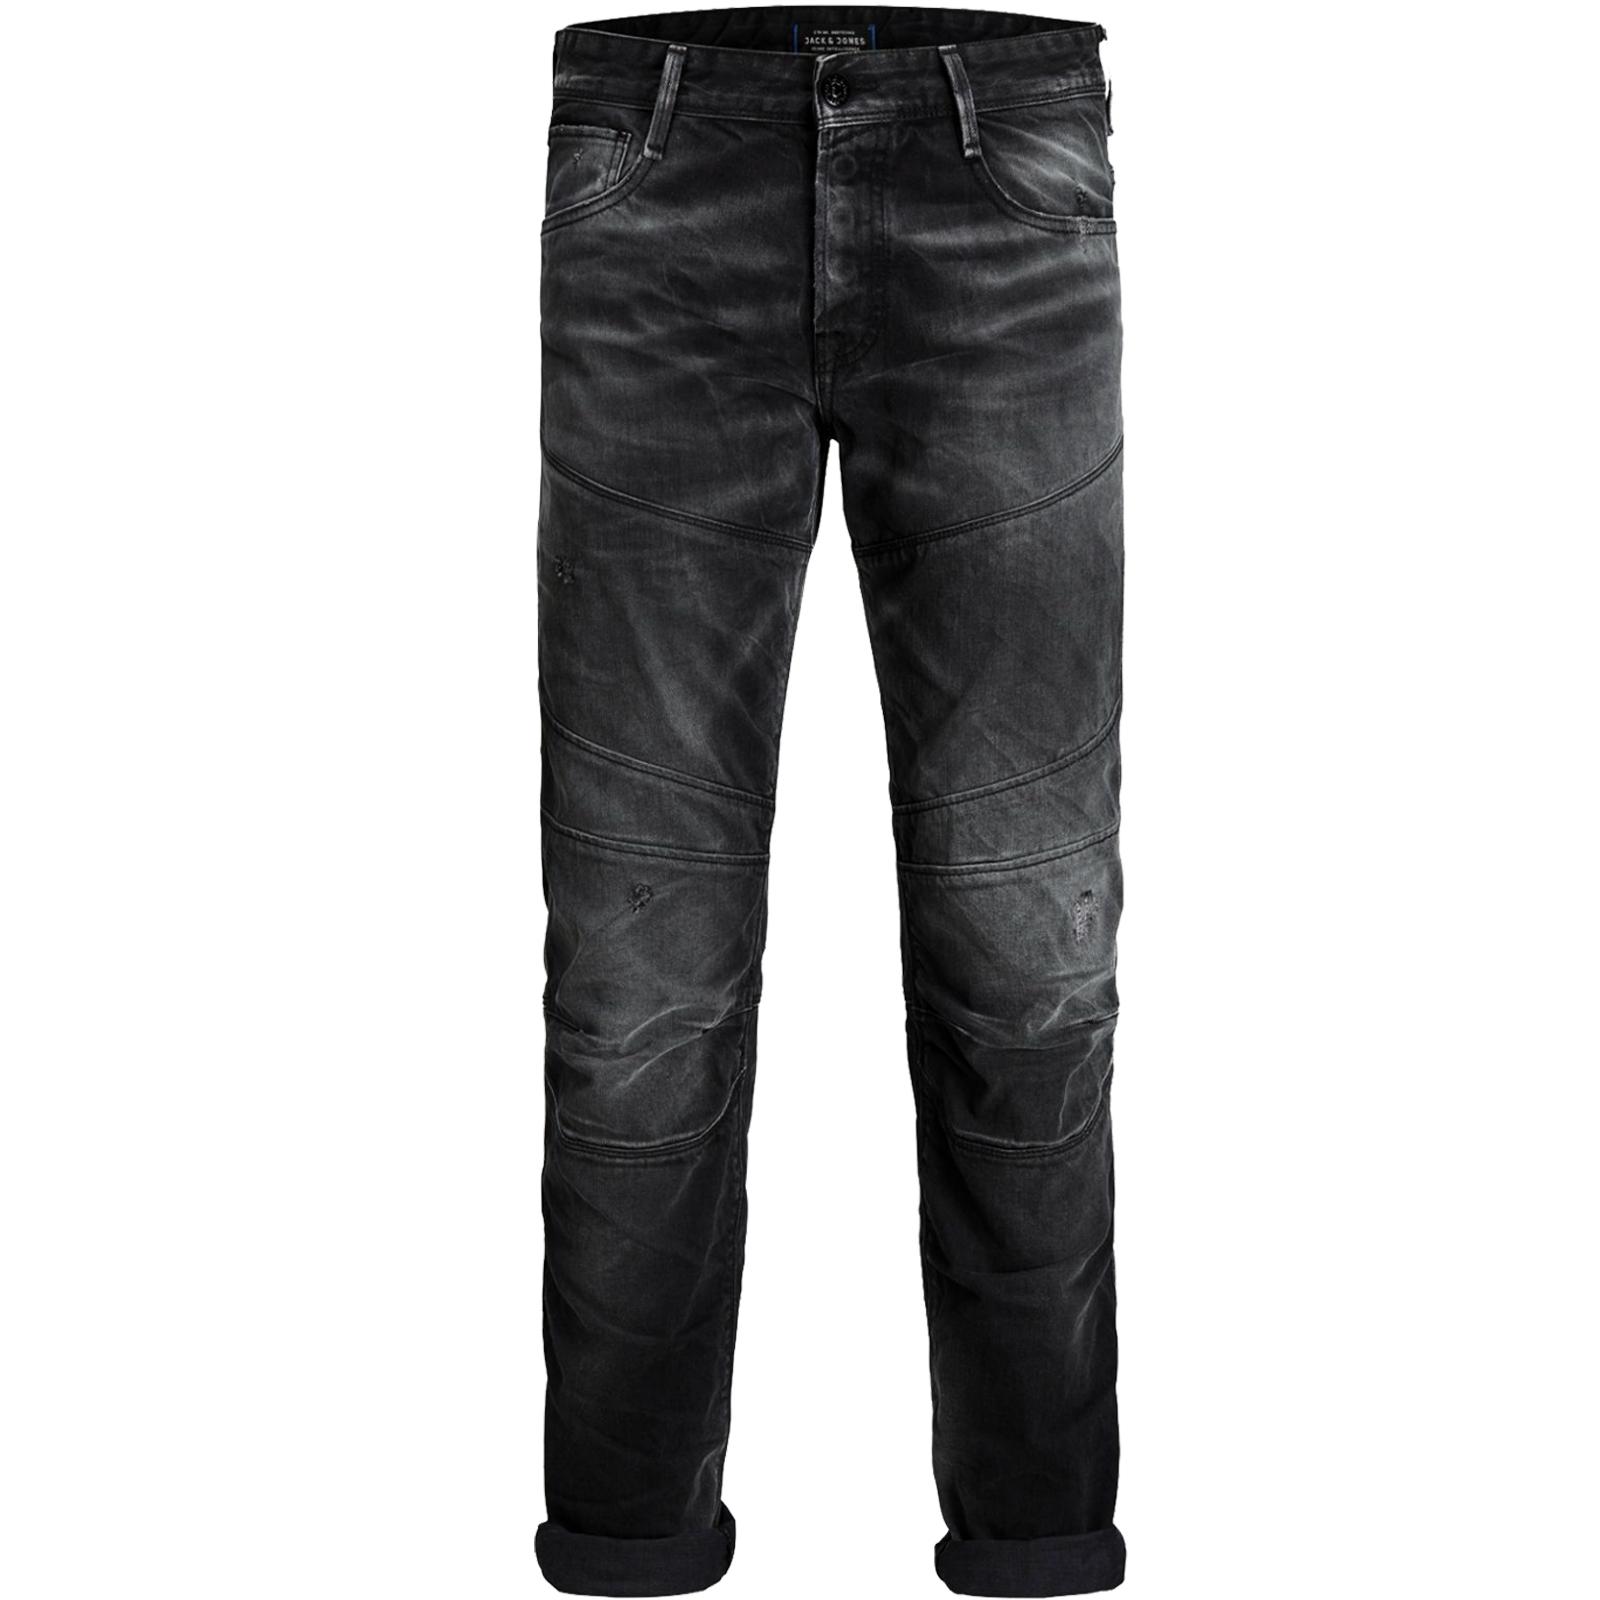 Jack Jones Jeans Herren Glenn 361 007 Tim 726 TOM 511 Slim FIT Stretch Men Hose